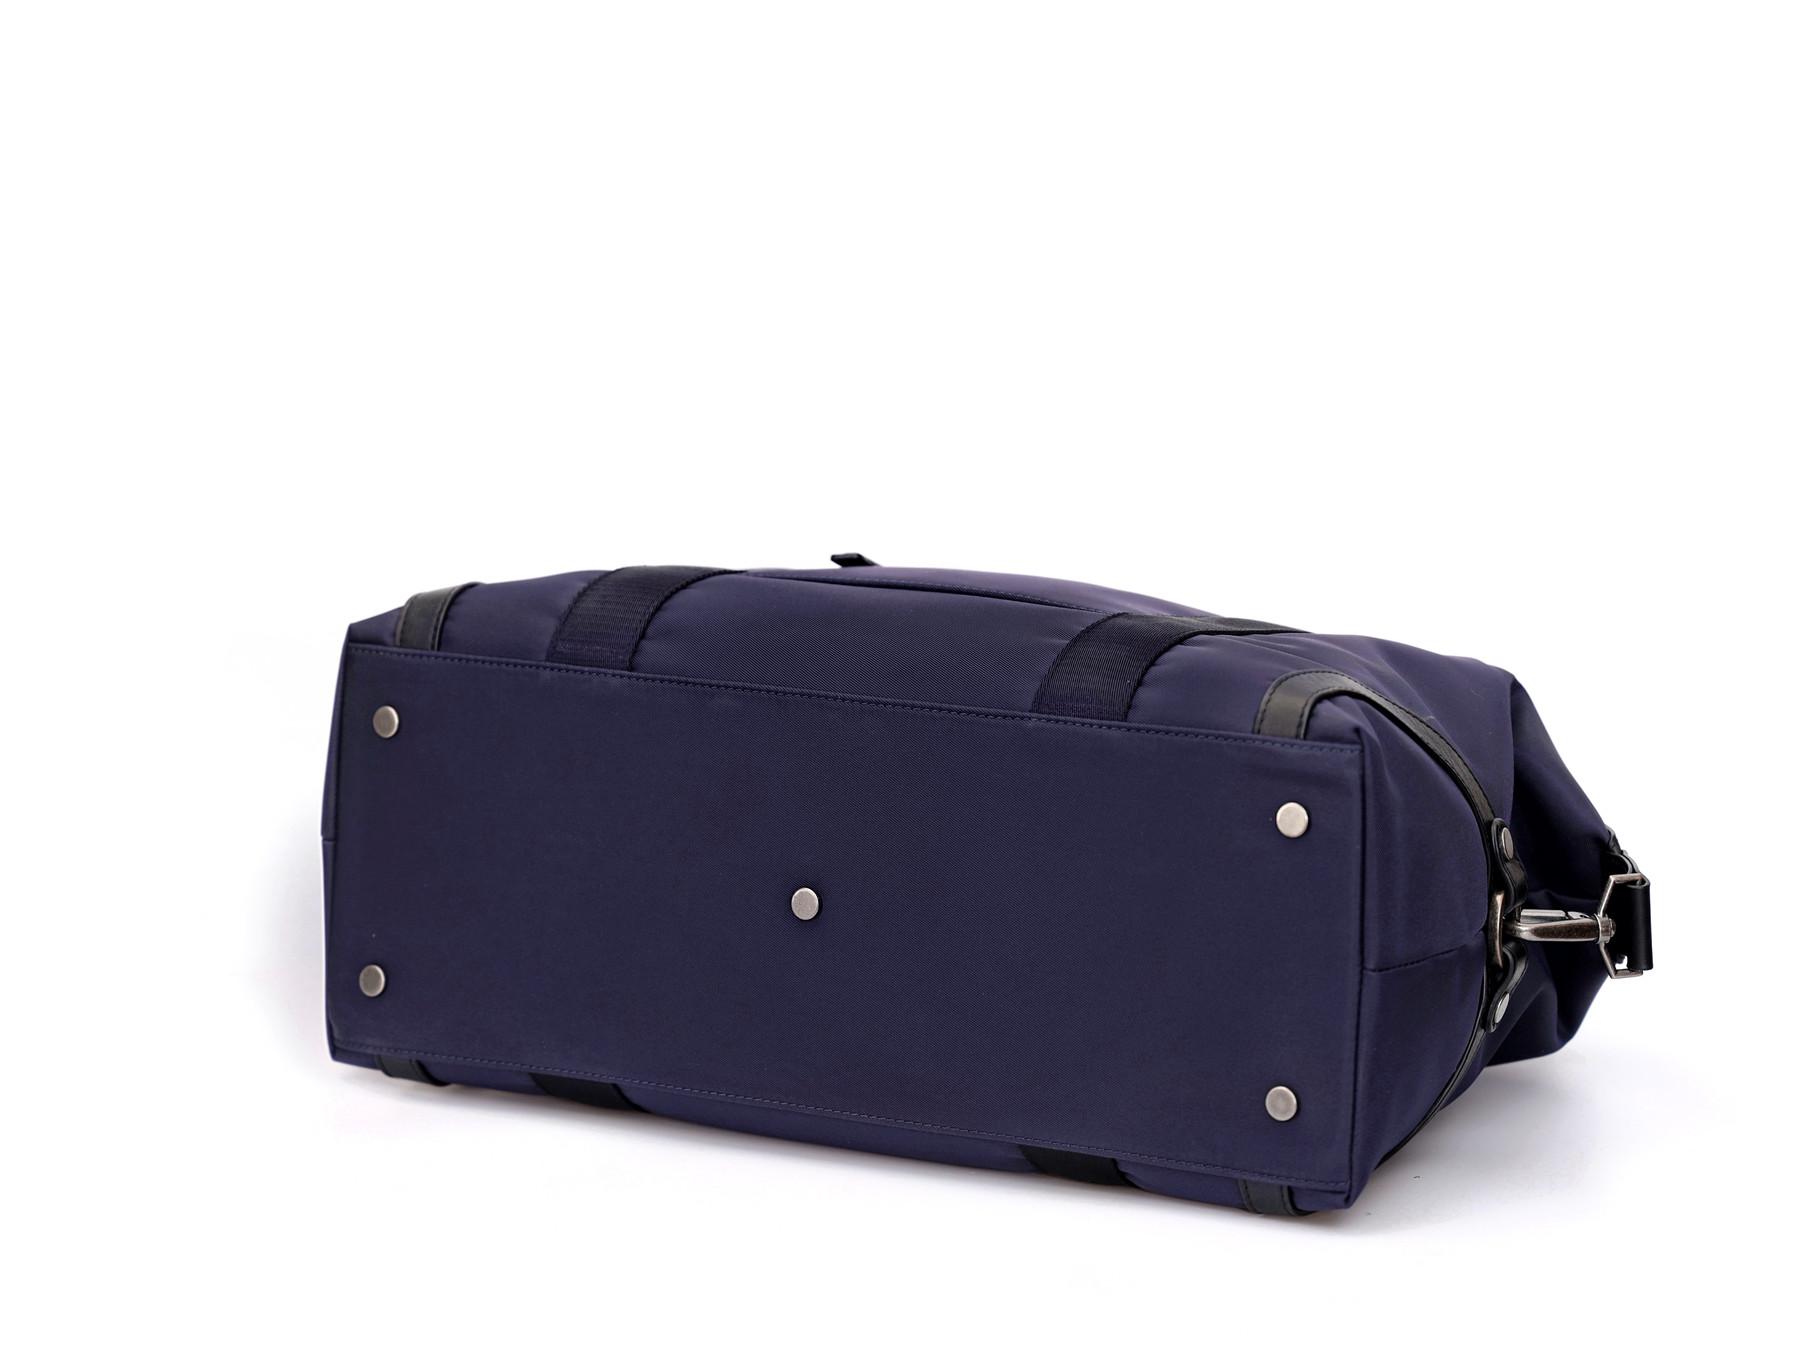 GF bags-Oem Mens Overnight Bag Manufacturer   Duffle-7